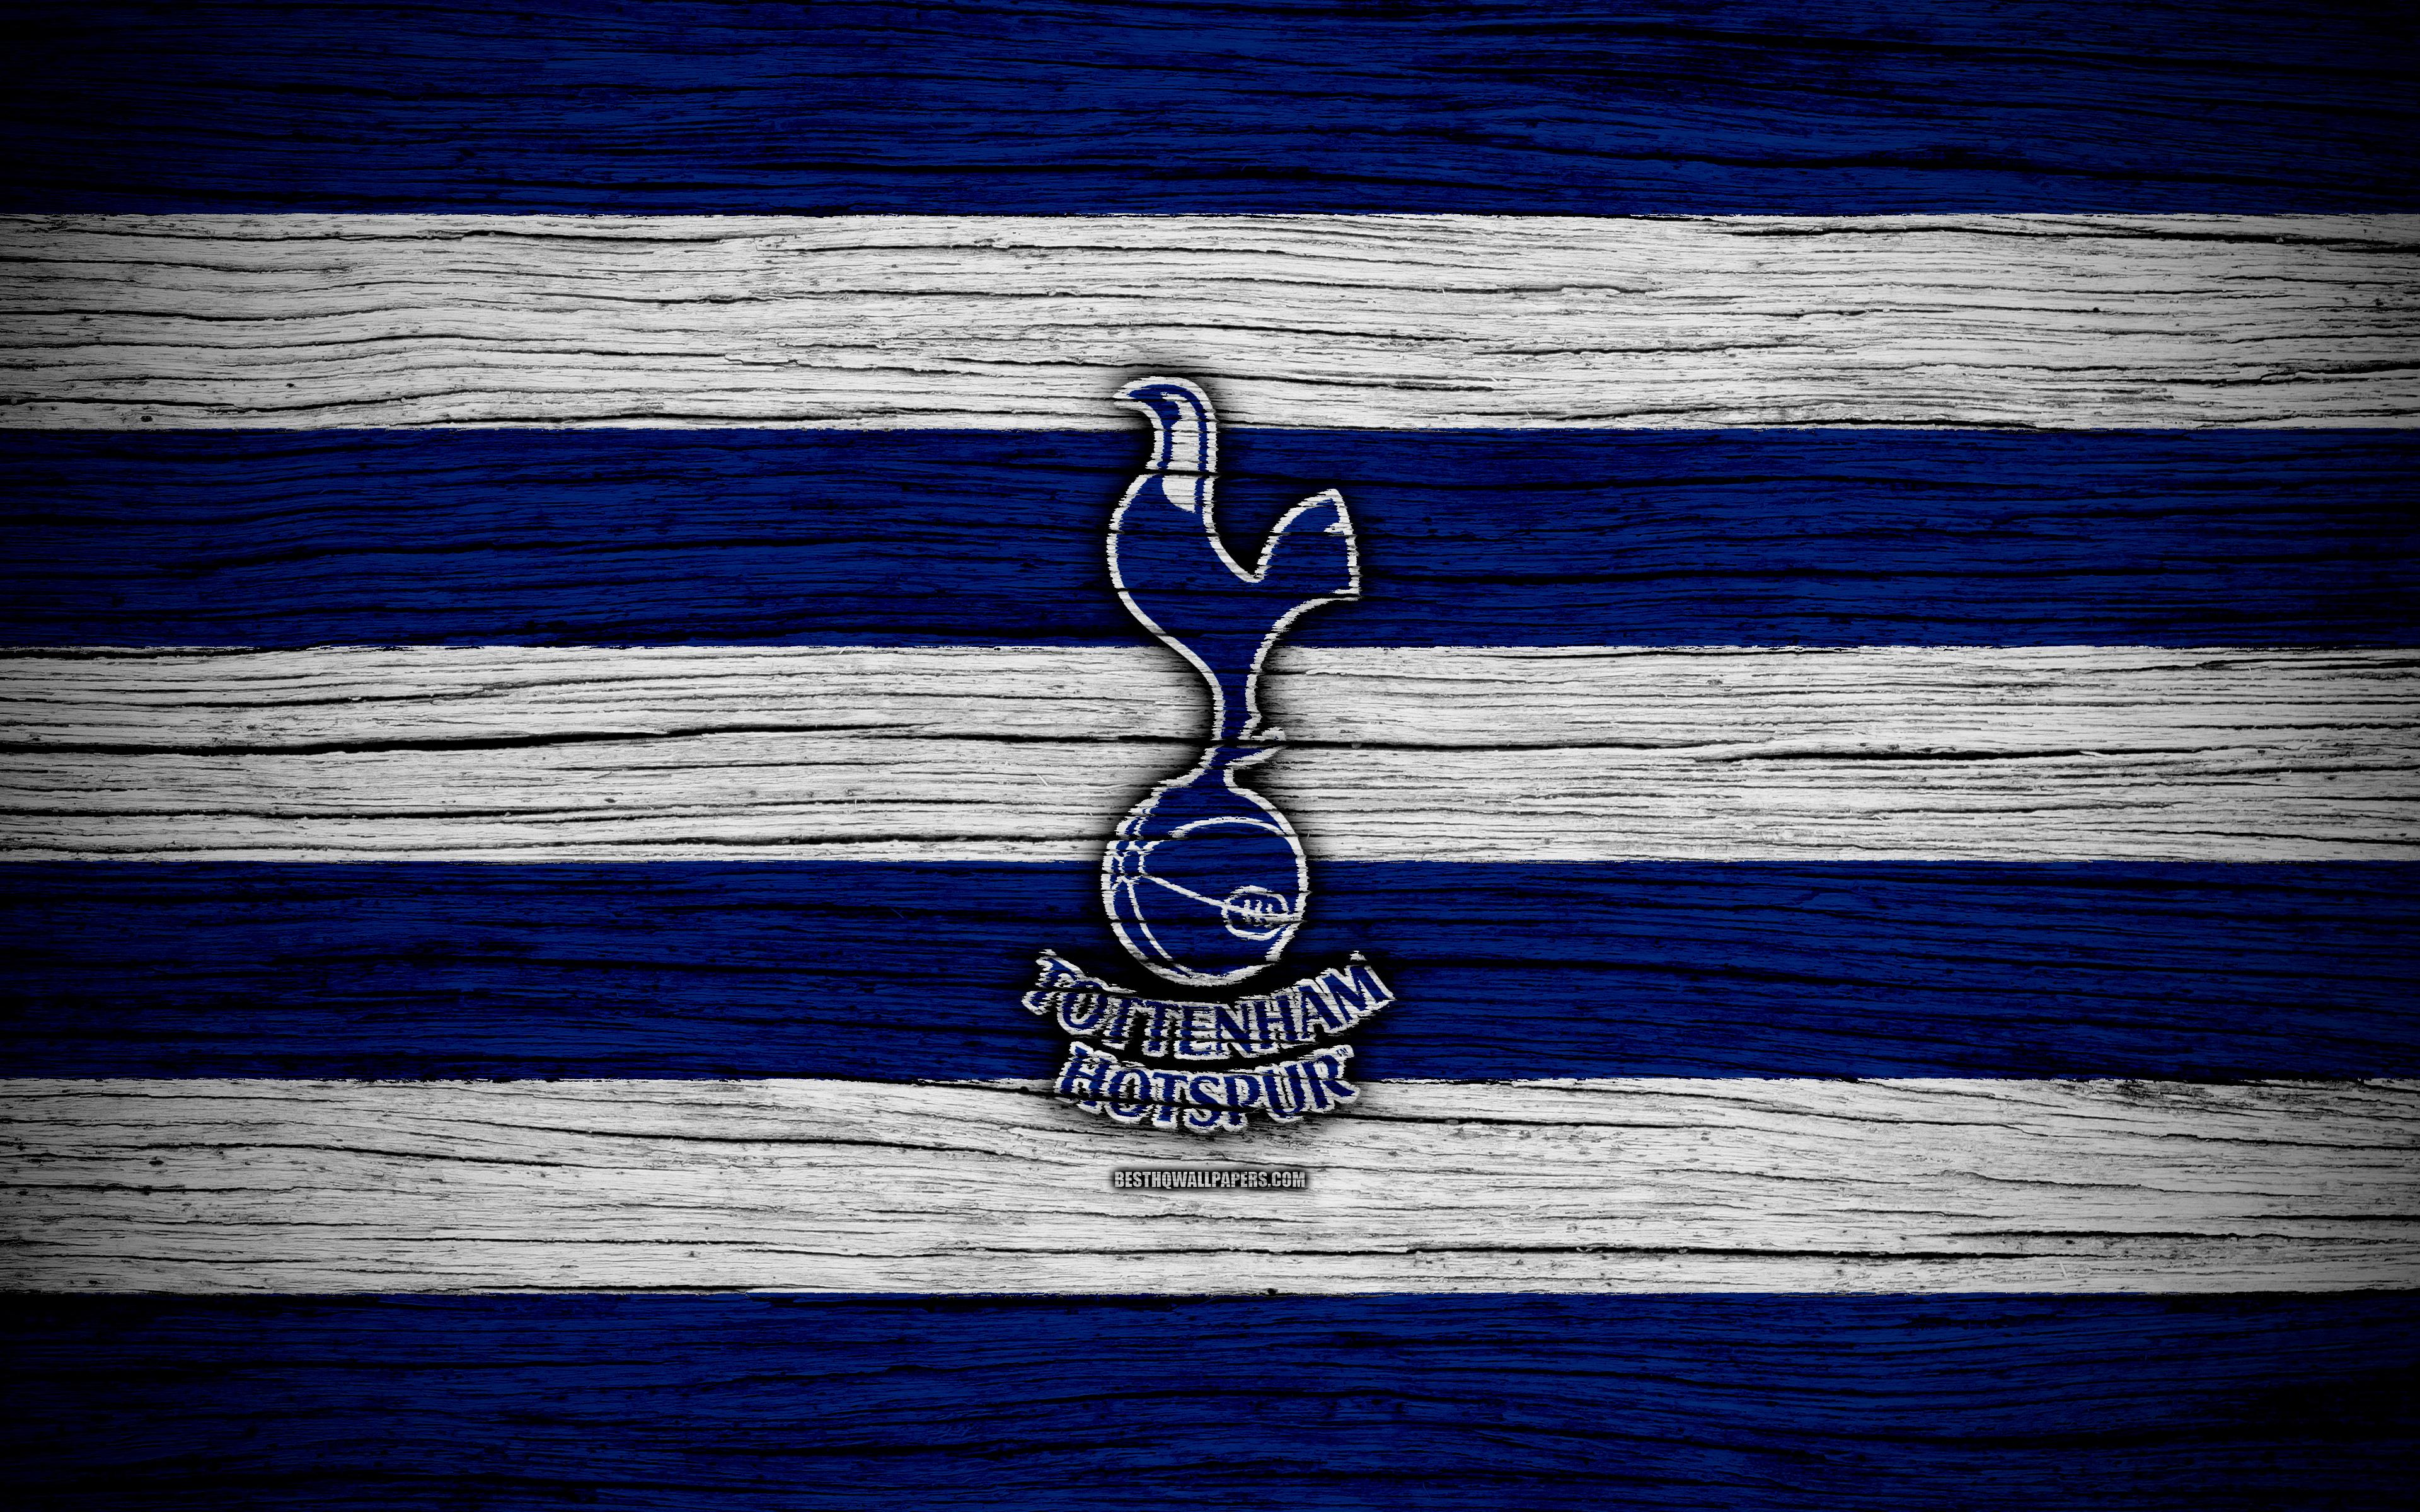 Tottenham Logo Wallpaper - Tottenham Hotspur Wallpapers ...